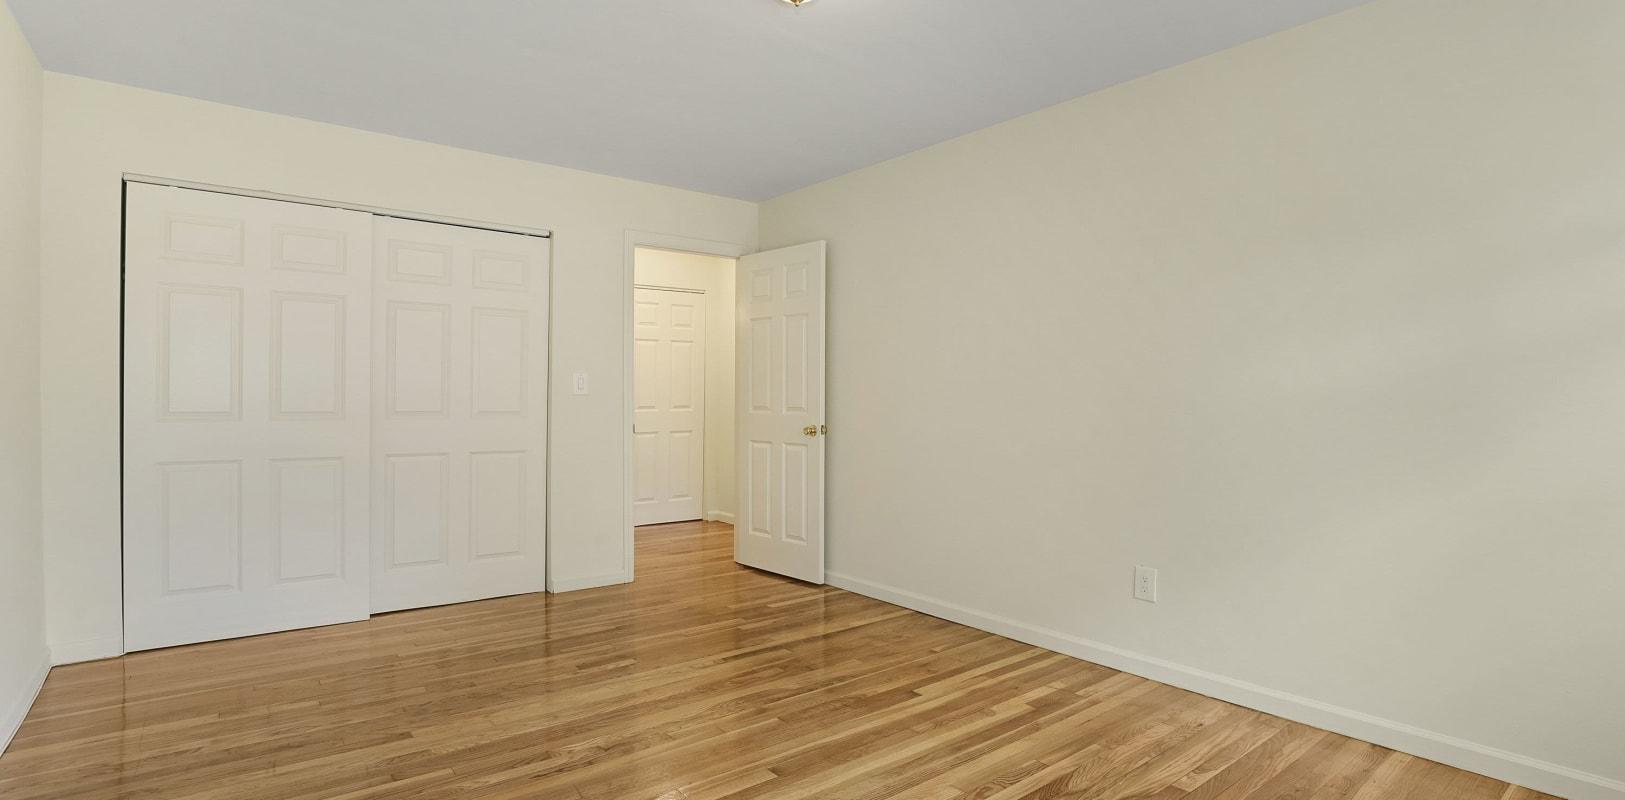 Cozy bedroom at Balmoral Arms in Matawan, New Jersey